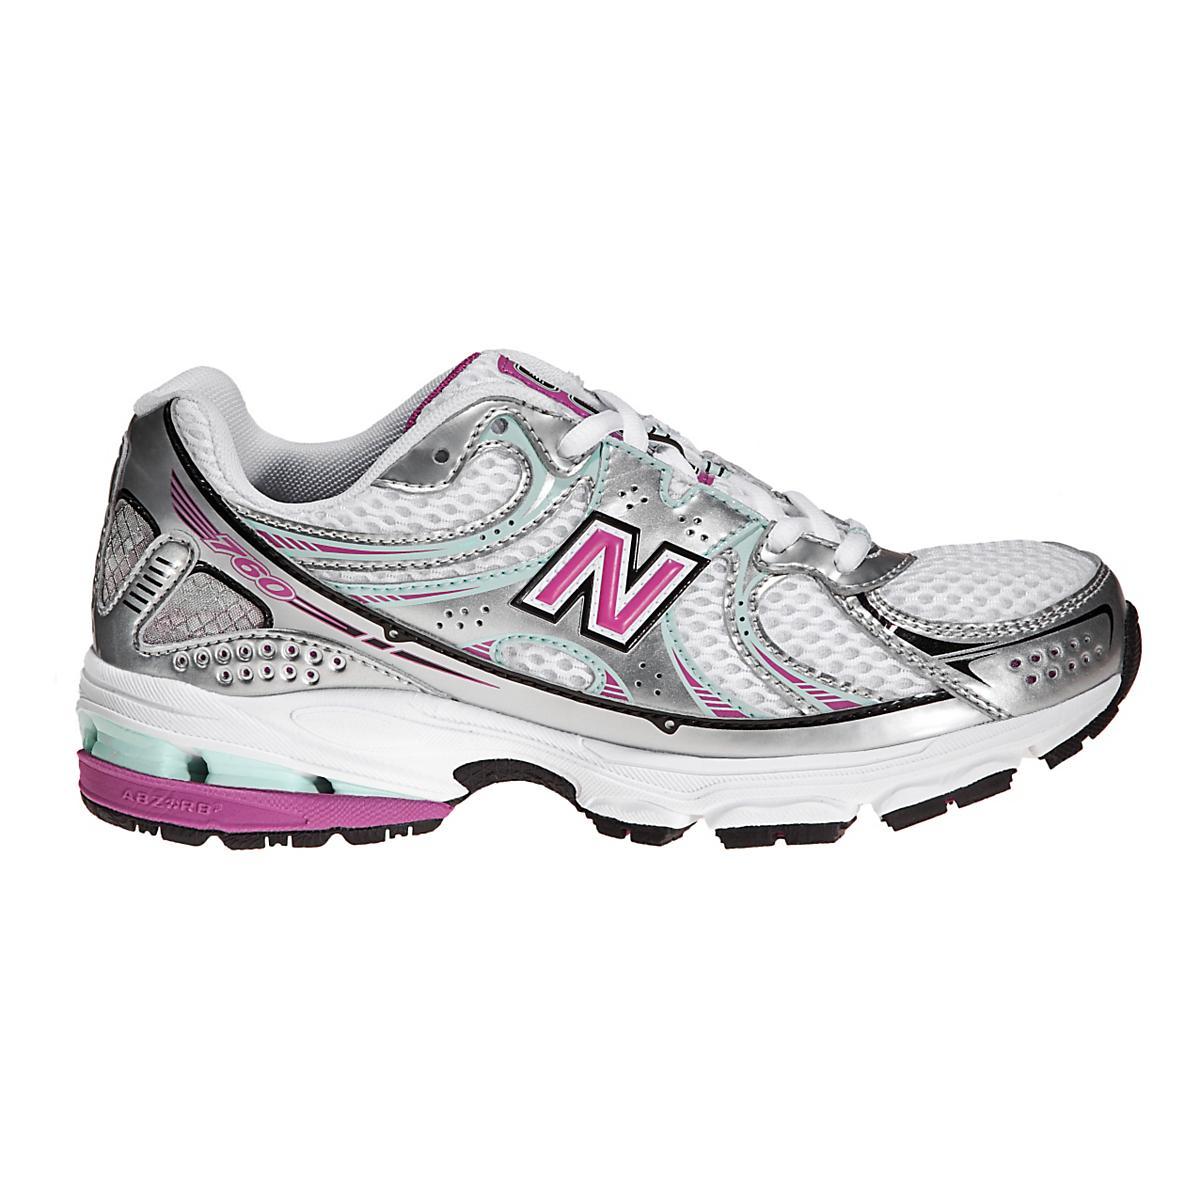 f8819ccbfbba Kids New Balance 760 Running Shoe at Road Runner Sports